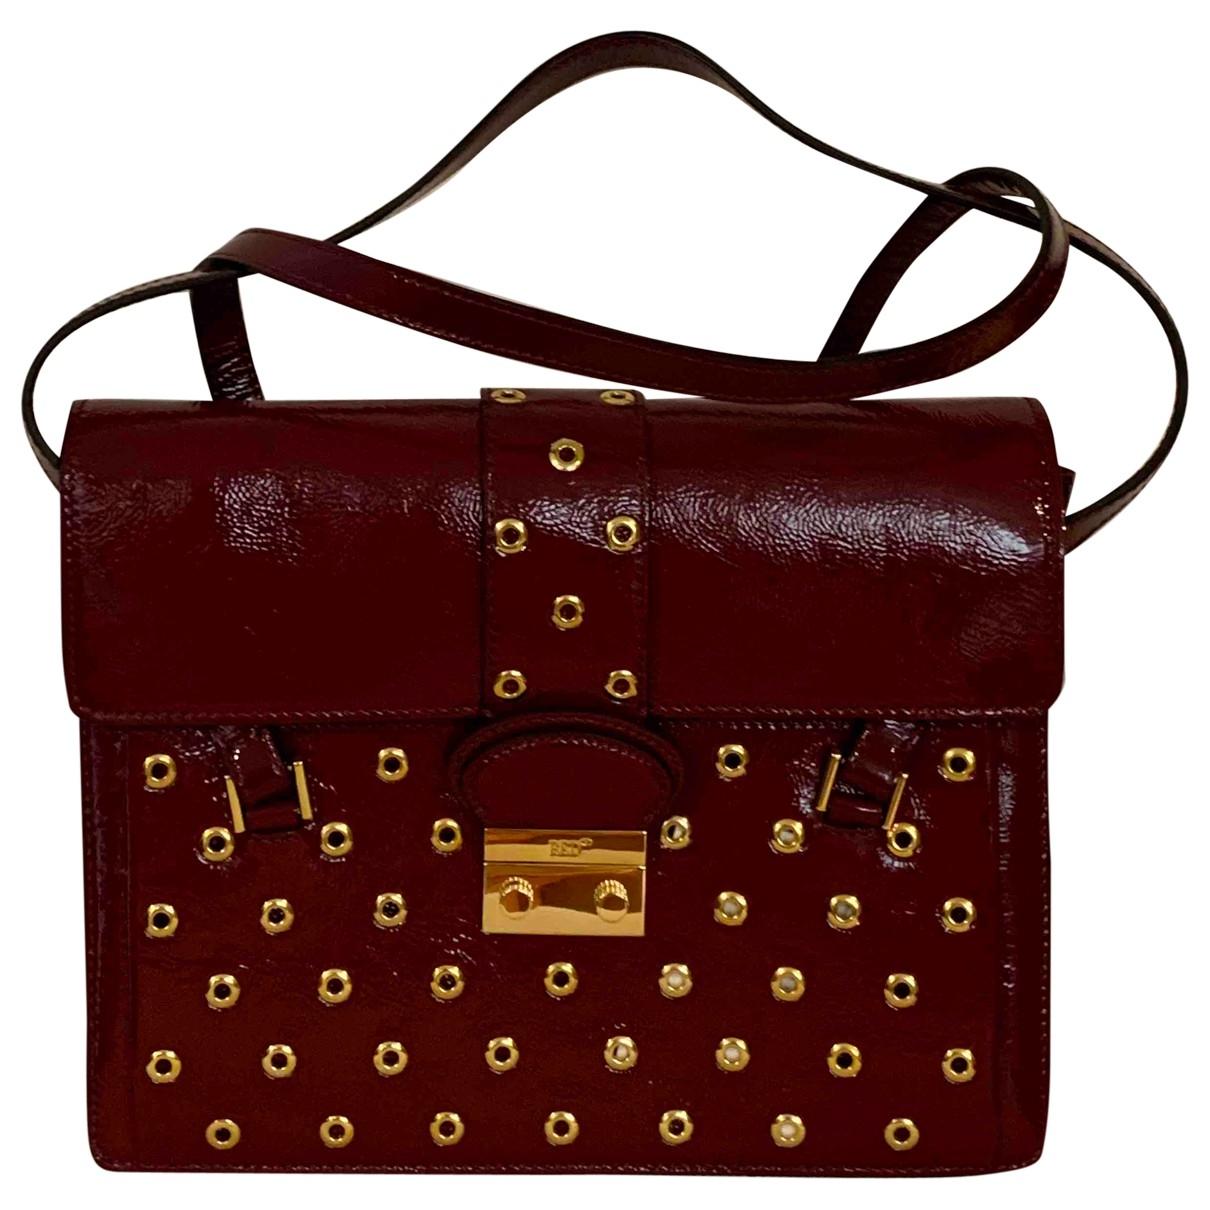 Red Valentino Garavani \N Patent leather handbag for Women \N